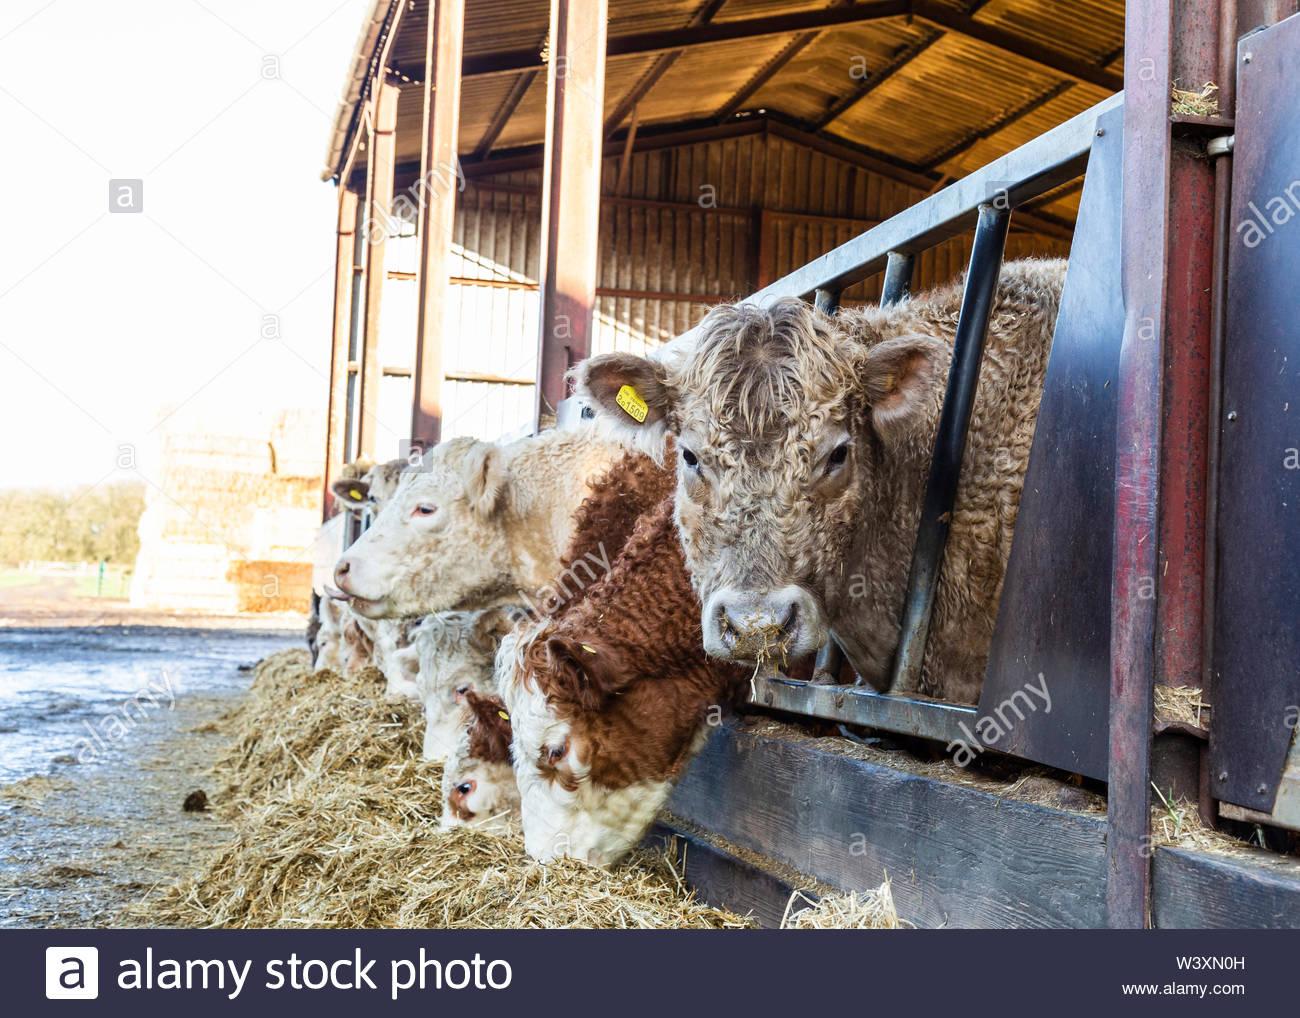 Cattle at Warwickshire Farm UK - Stock Image